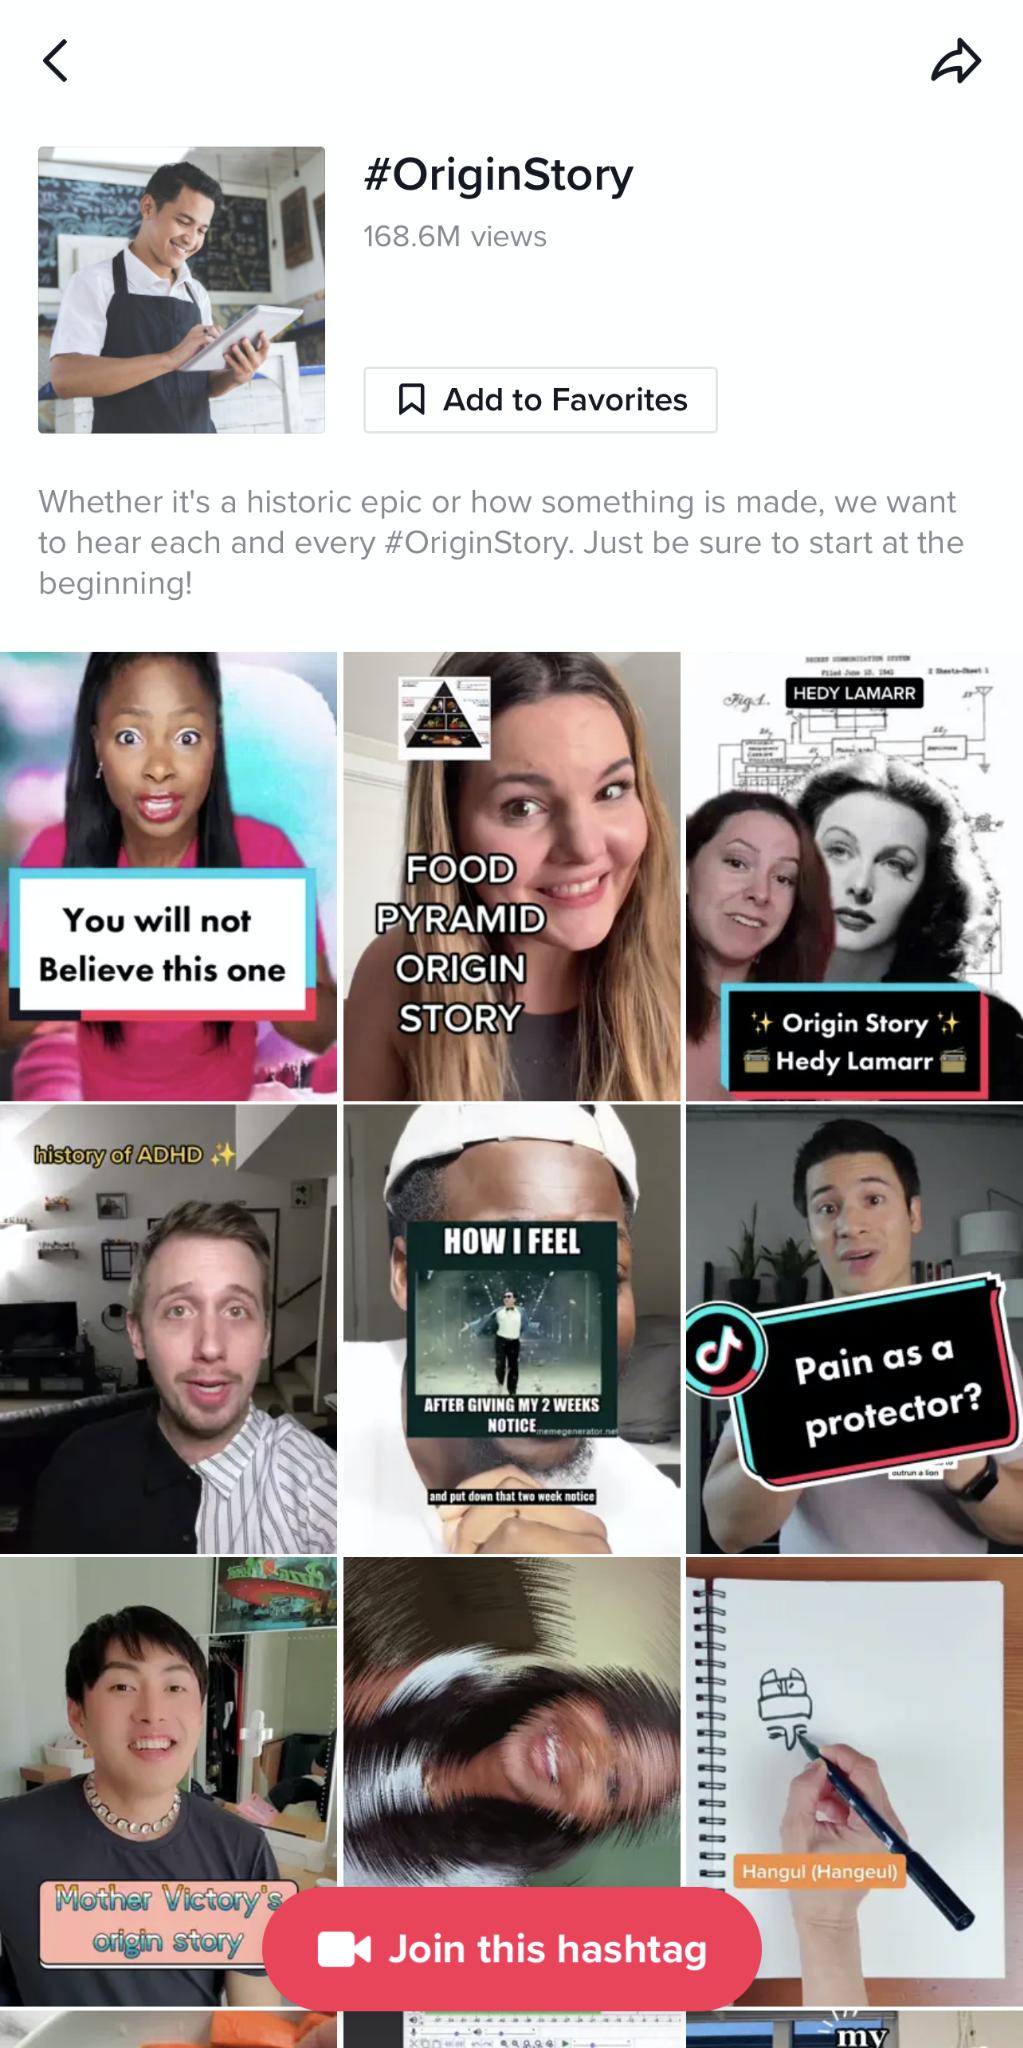 #originstory hashtag page